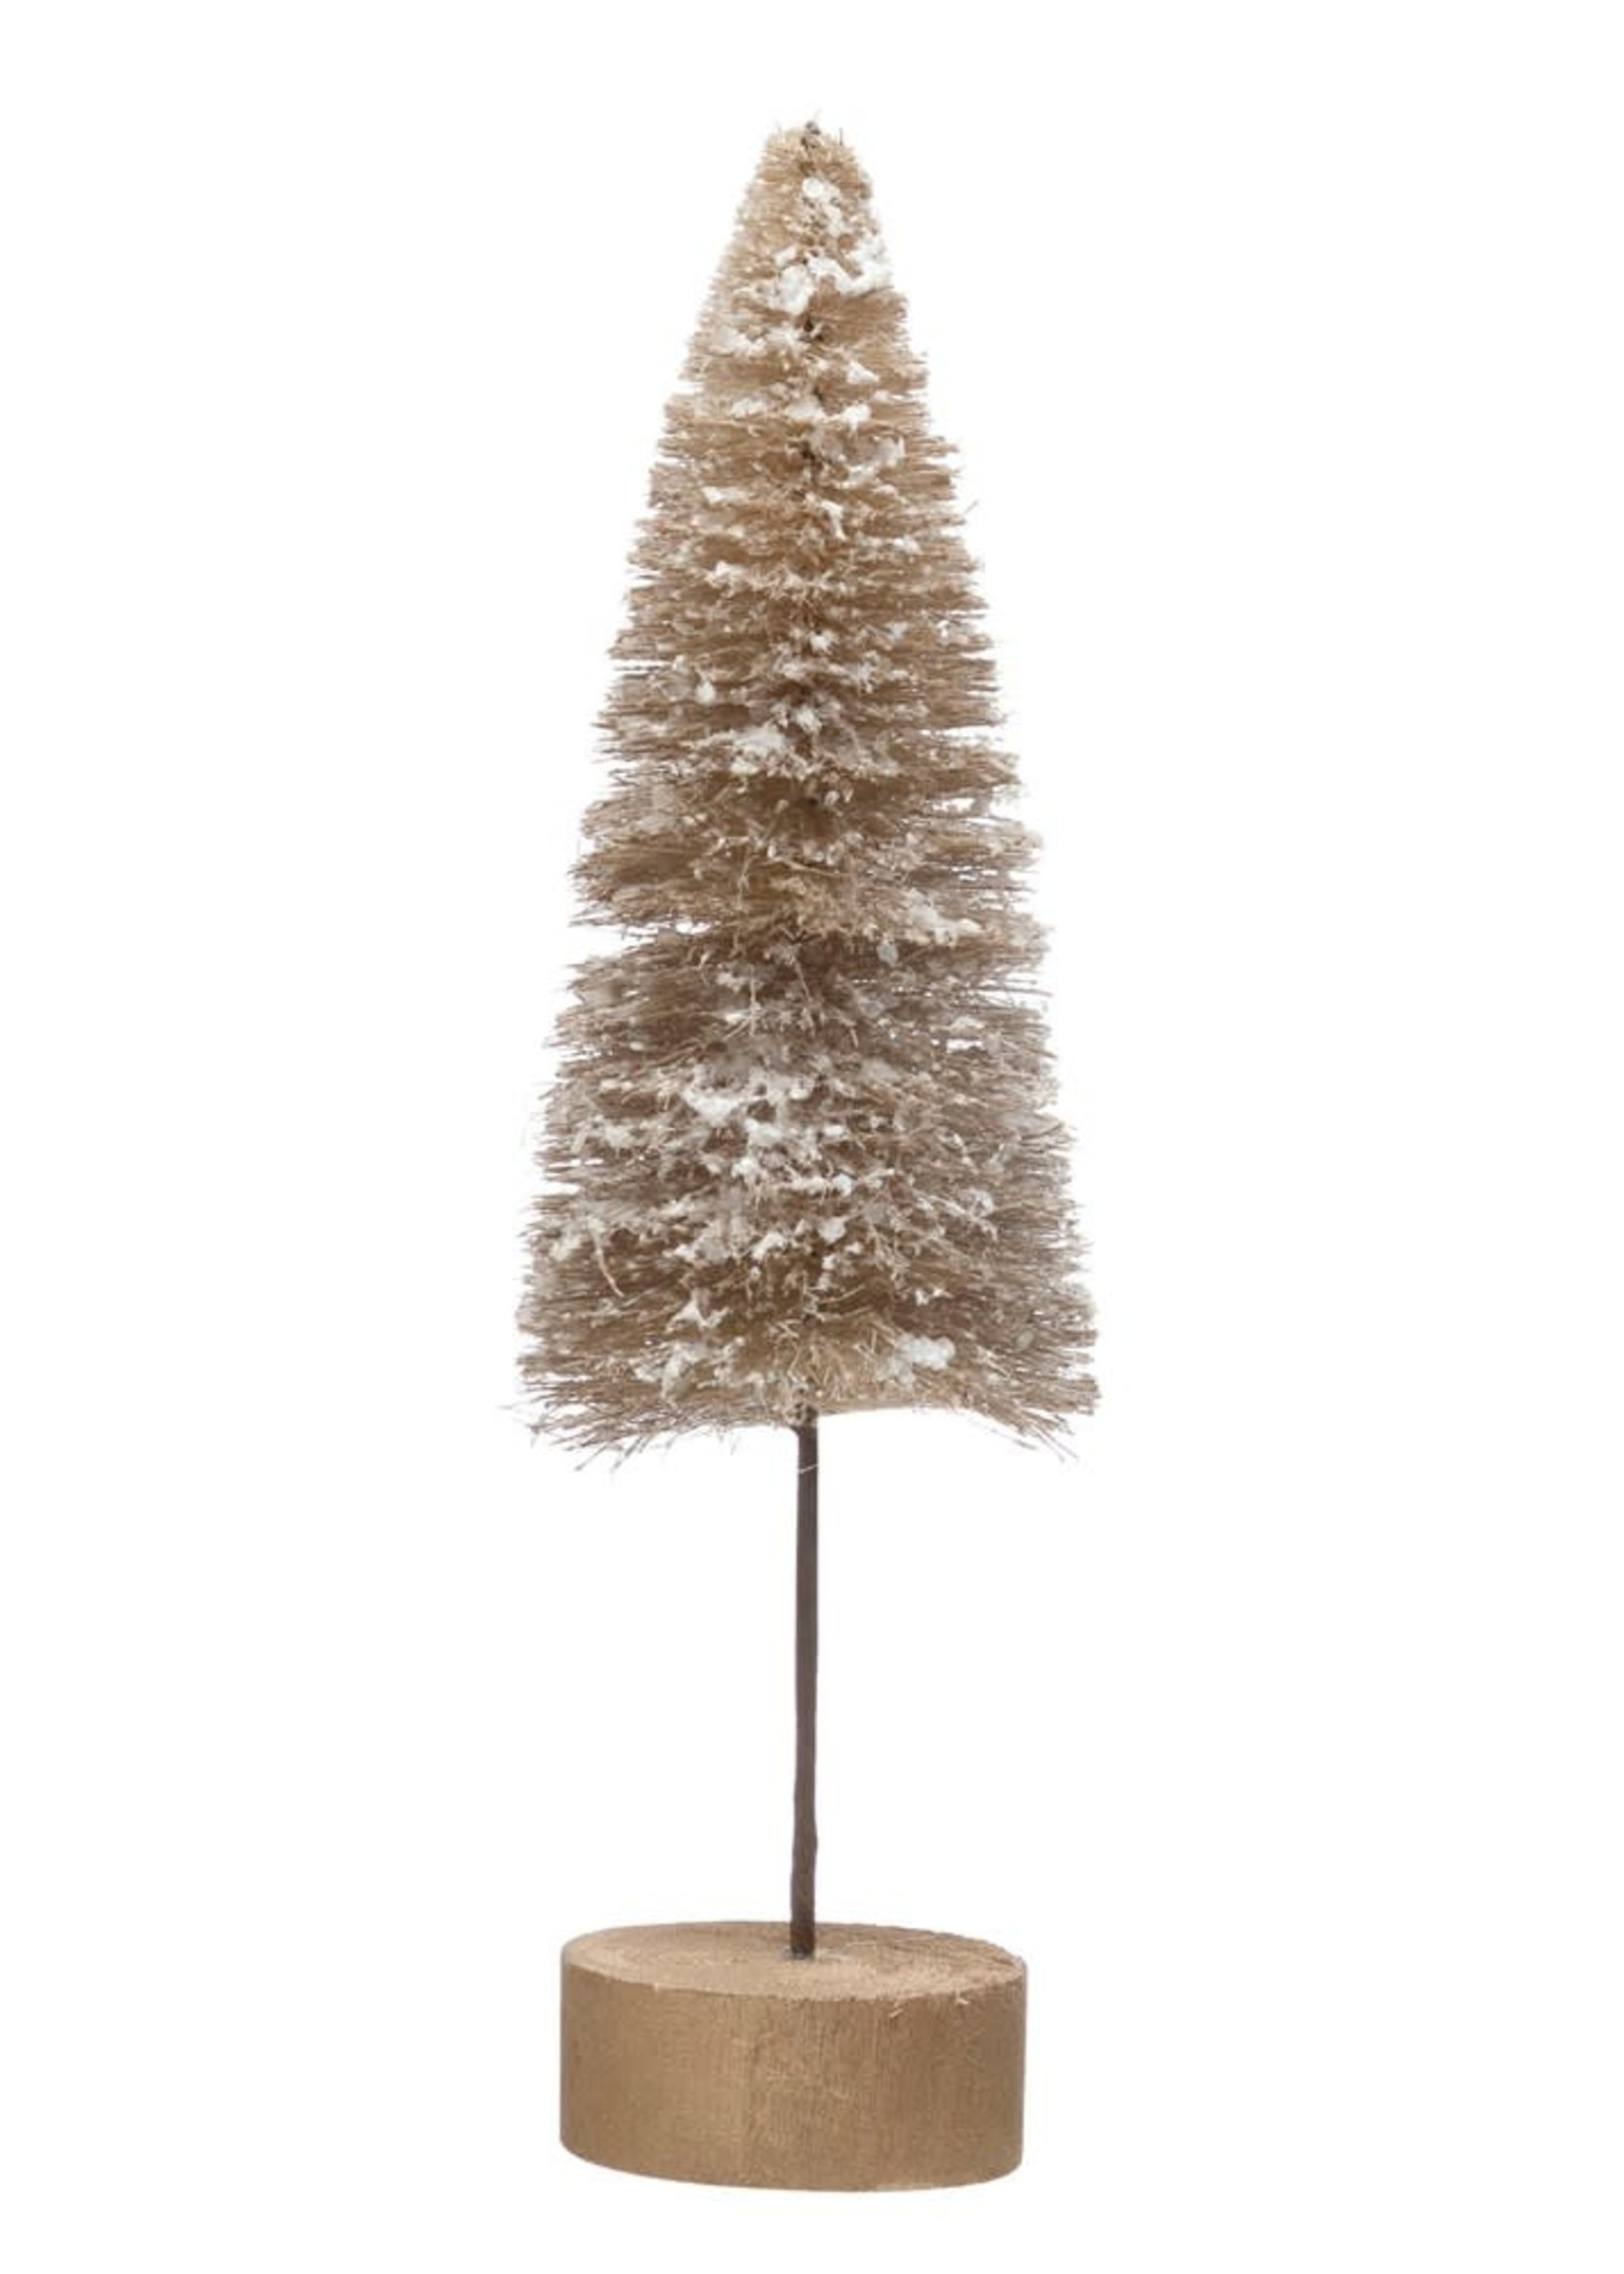 "3-1/2"" Round x 11-3/4""H Sisal Bottle Brush Tree w/ Faux Snow & Wood Base, Tan Color"